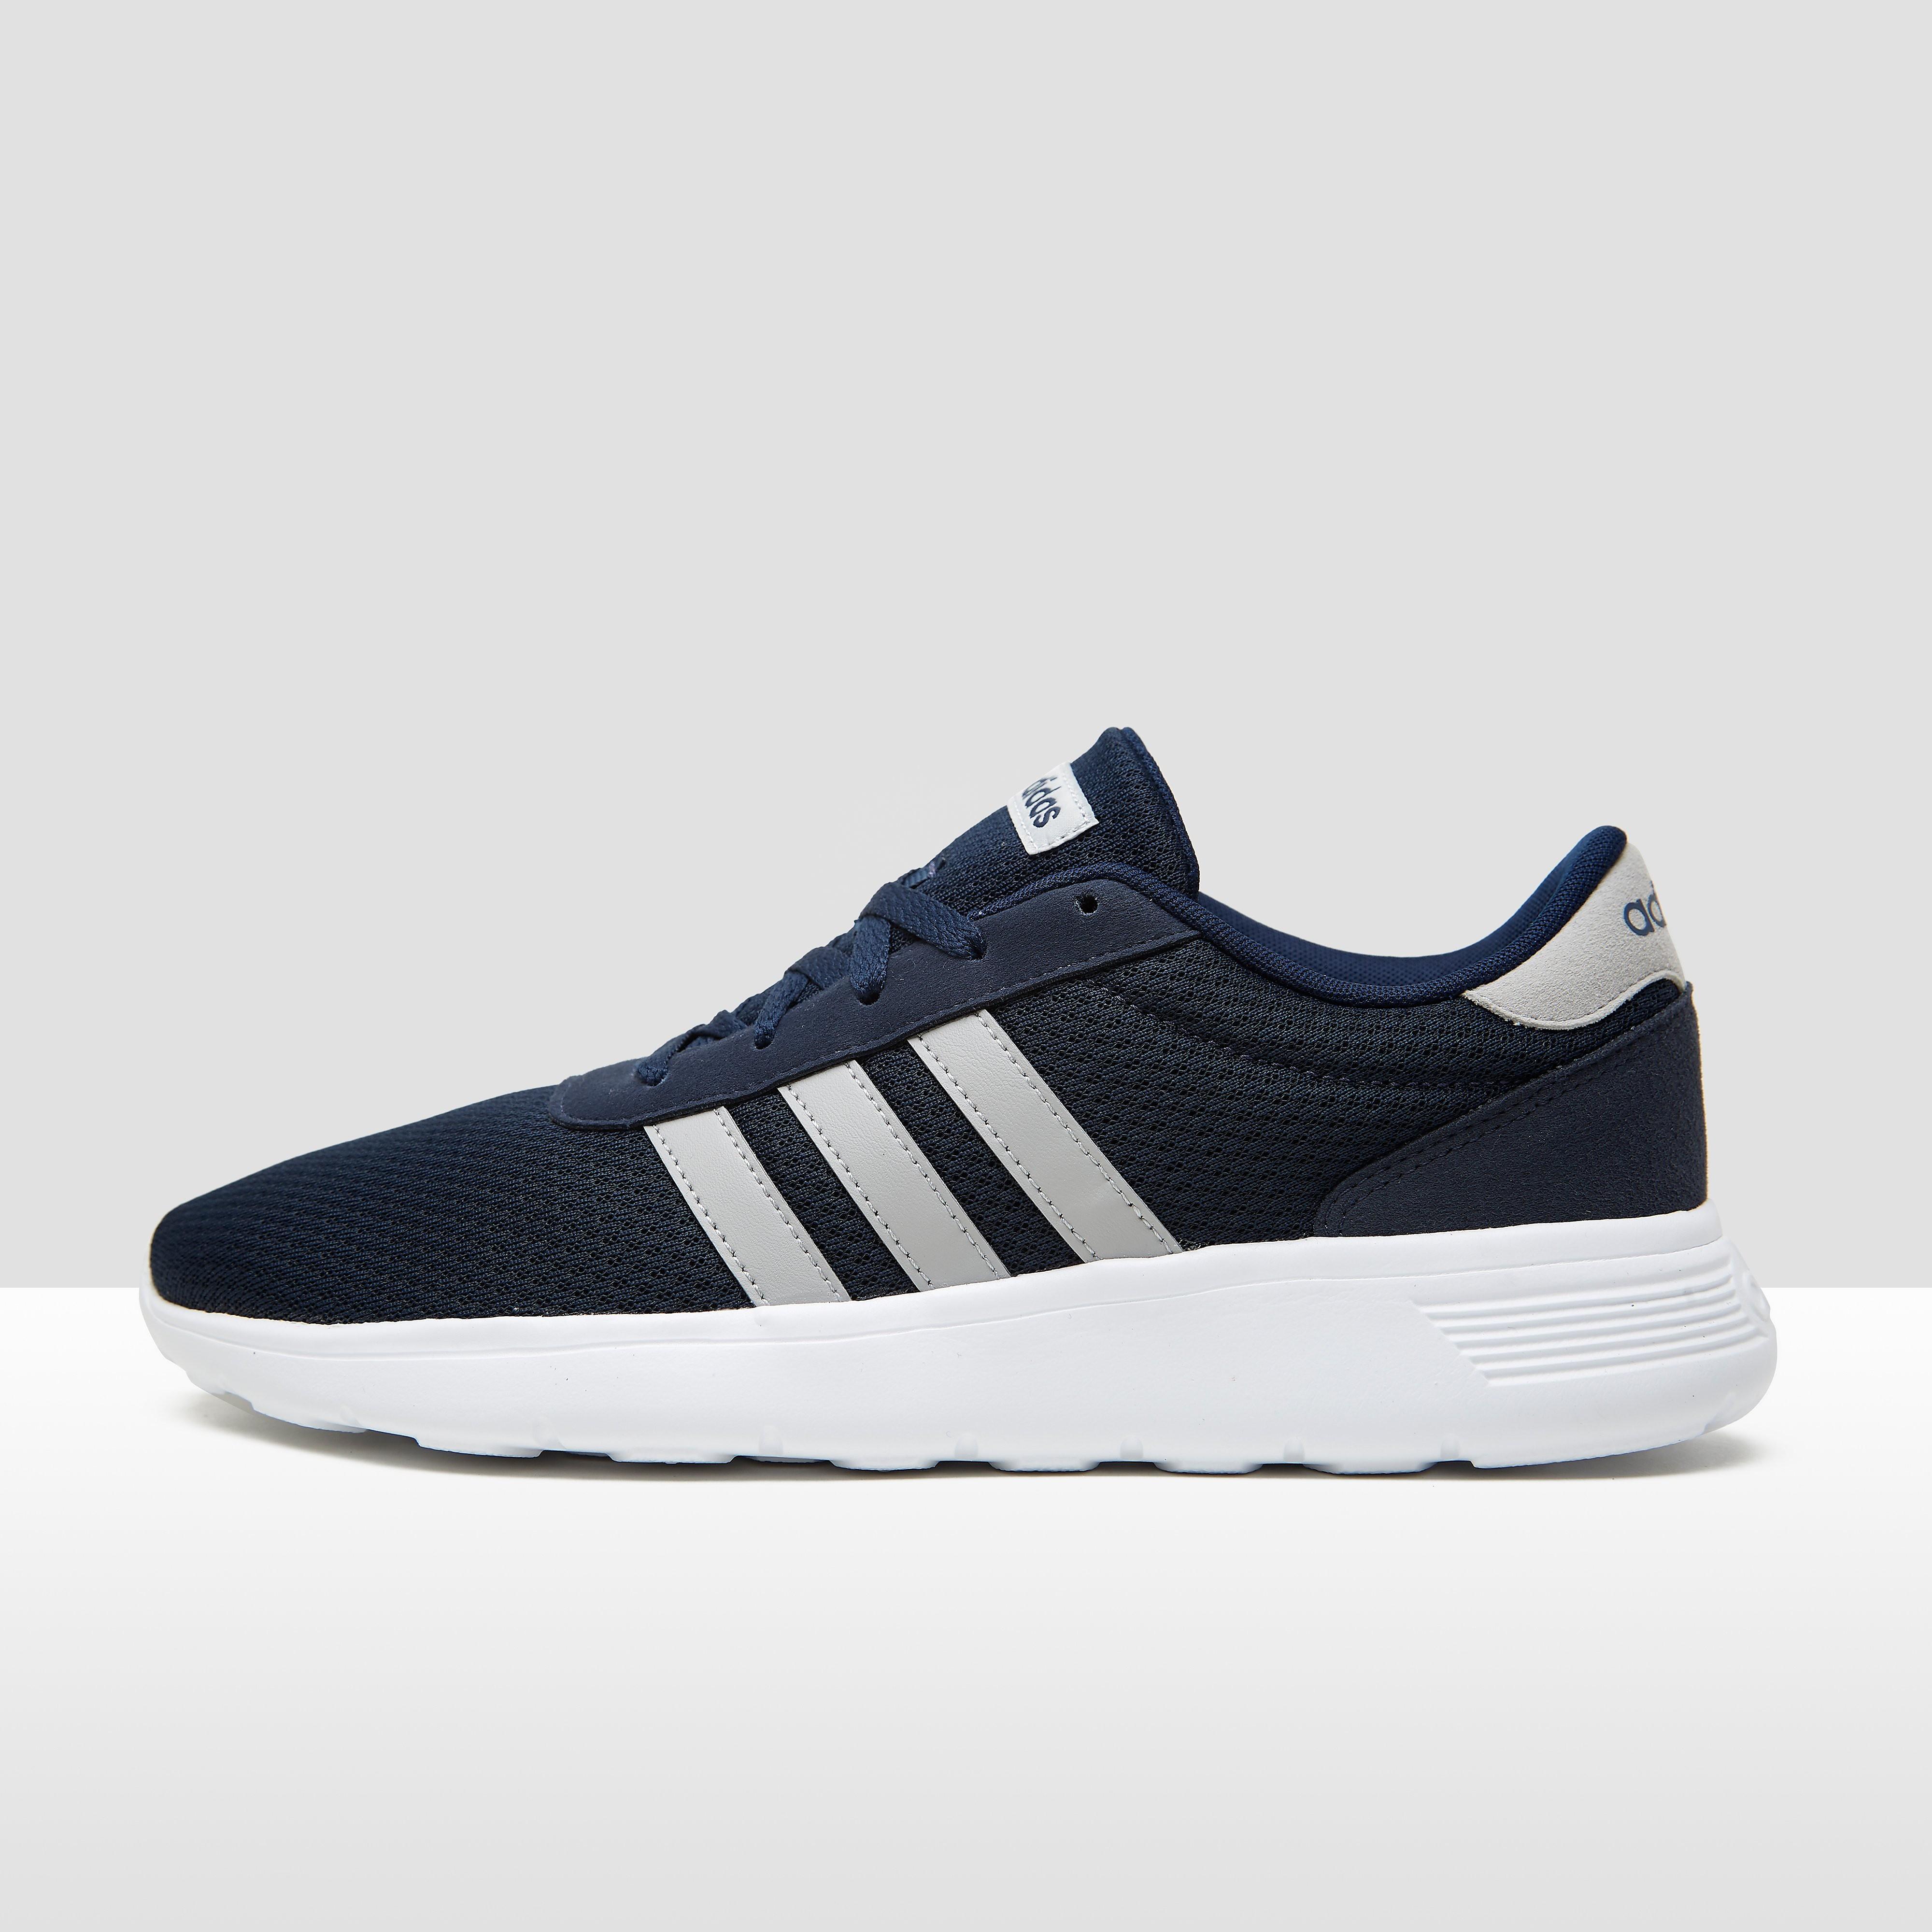 Adidas Lite Racer herensneaker blauw